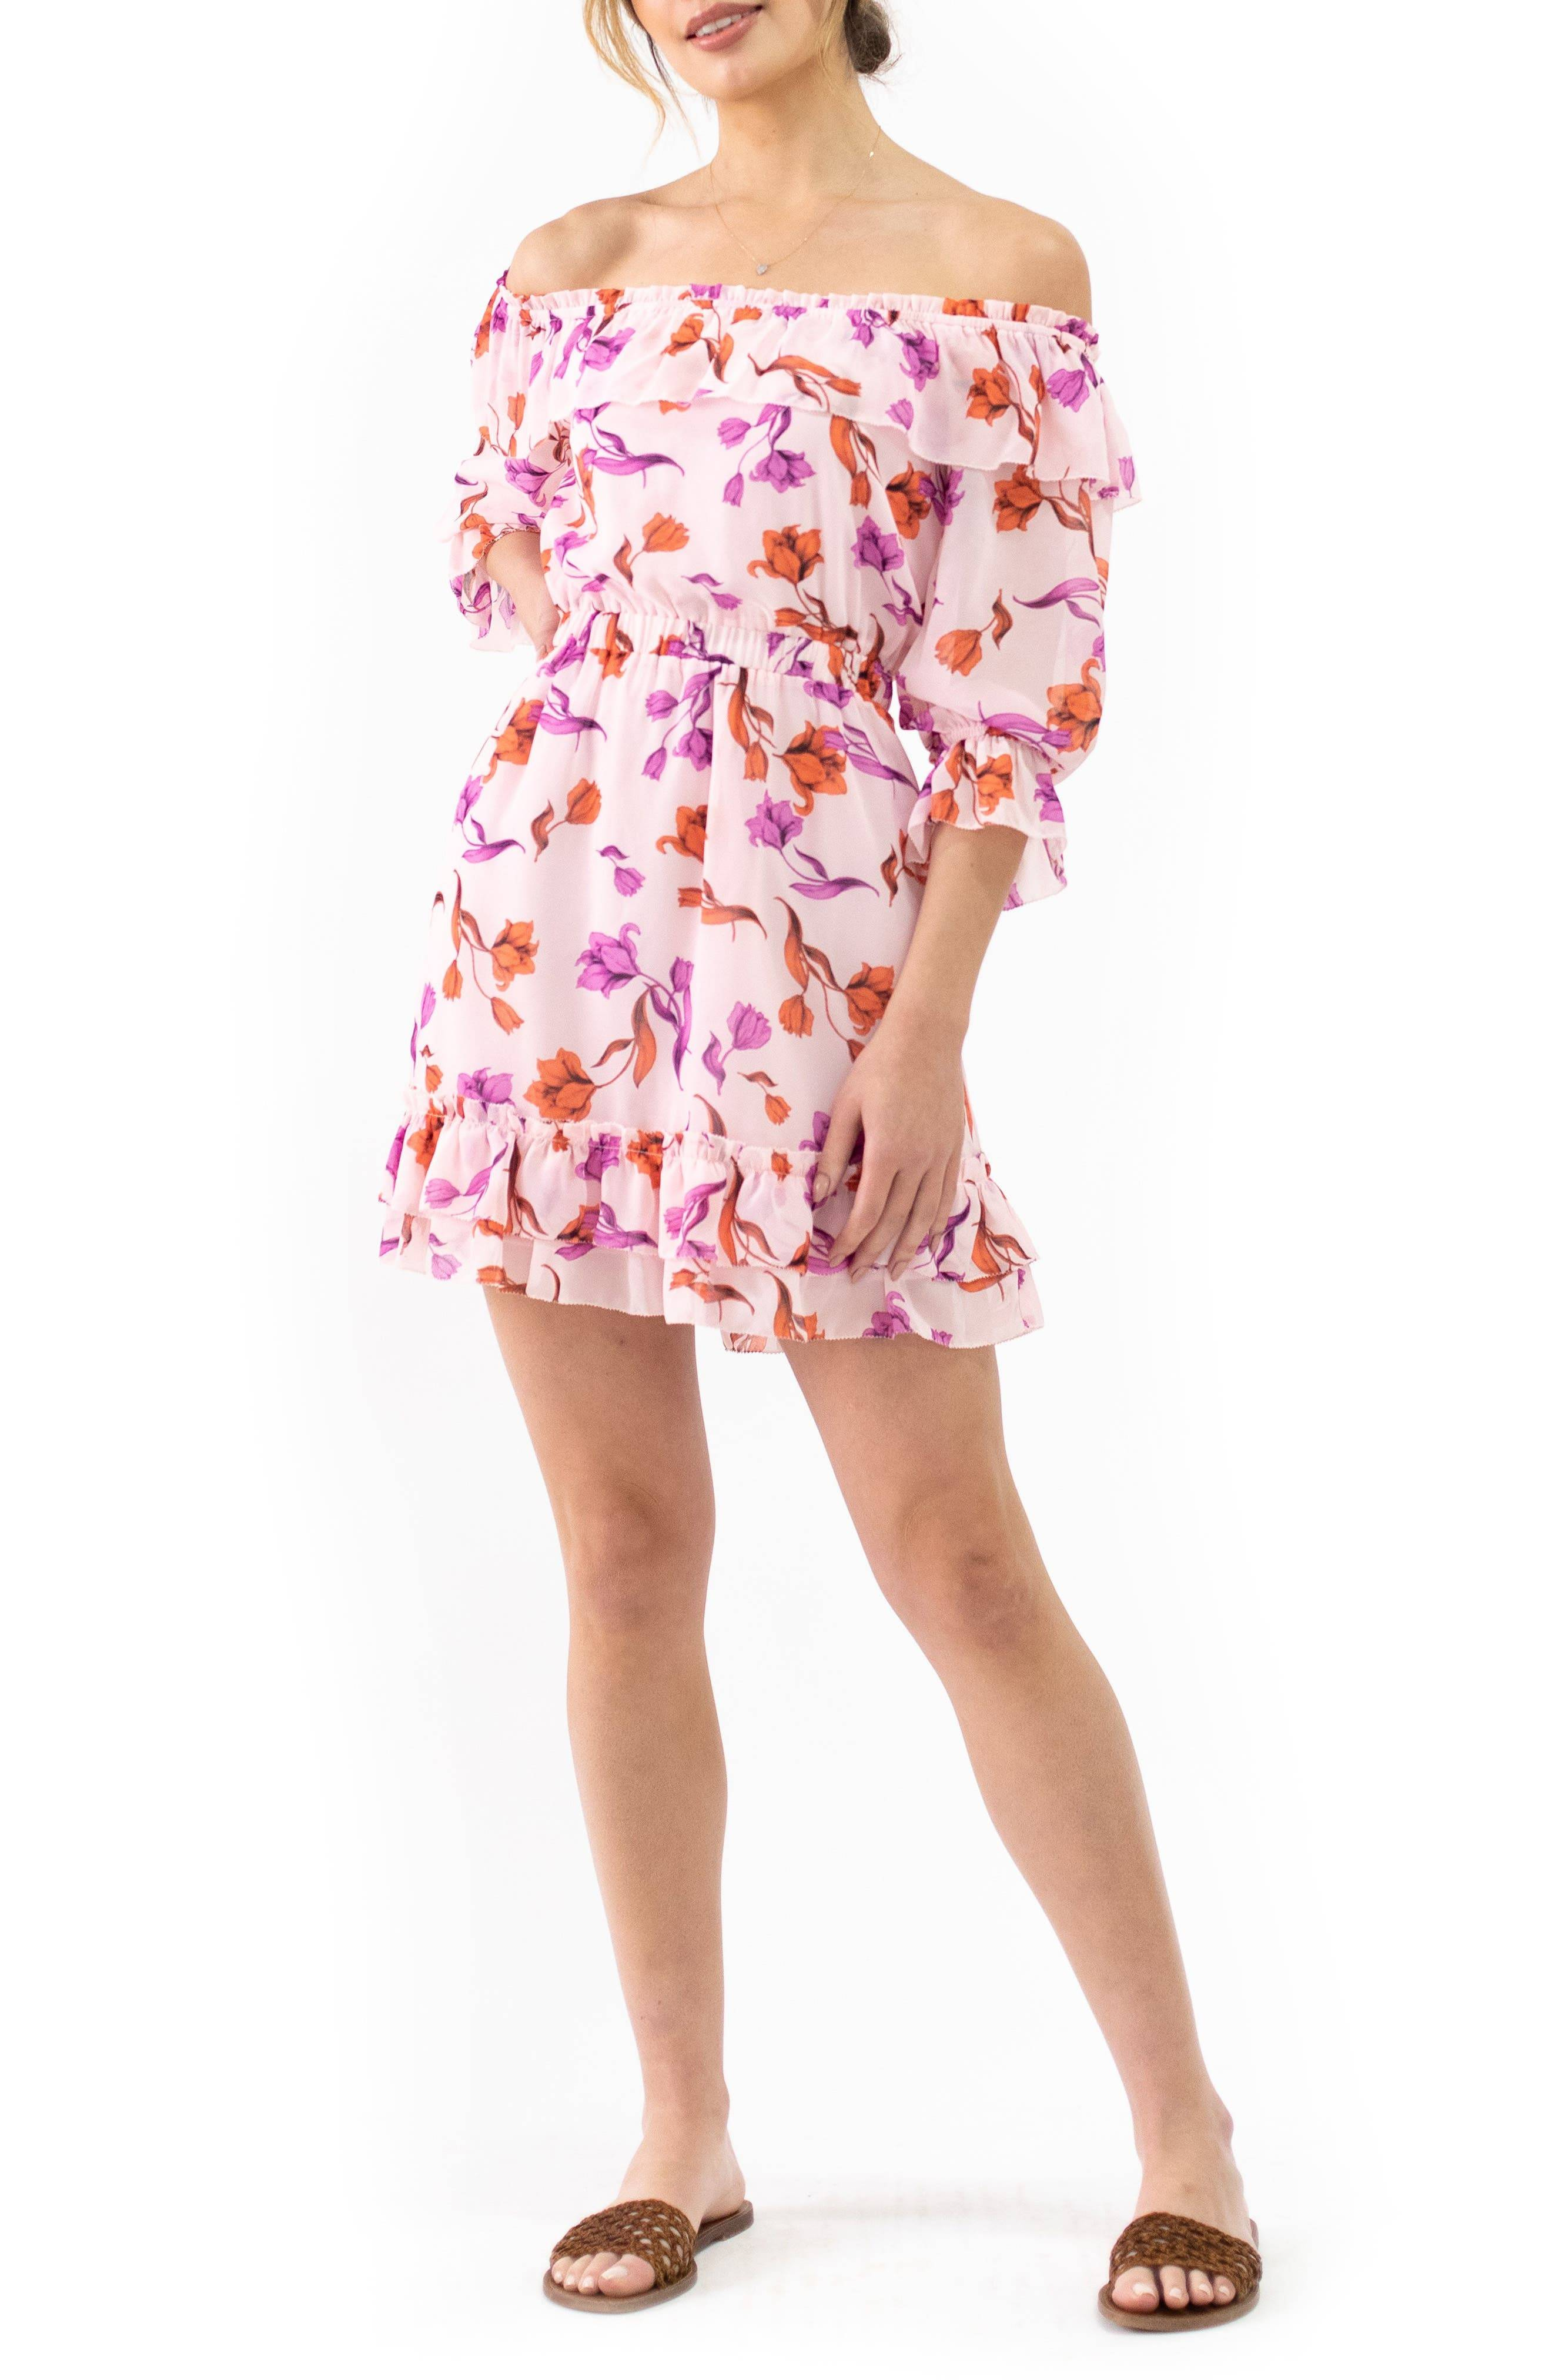 Lost + Wander Women's Lost + Wander Garden Of Delight Off The Shoulder Minidress, Size Large - Pink